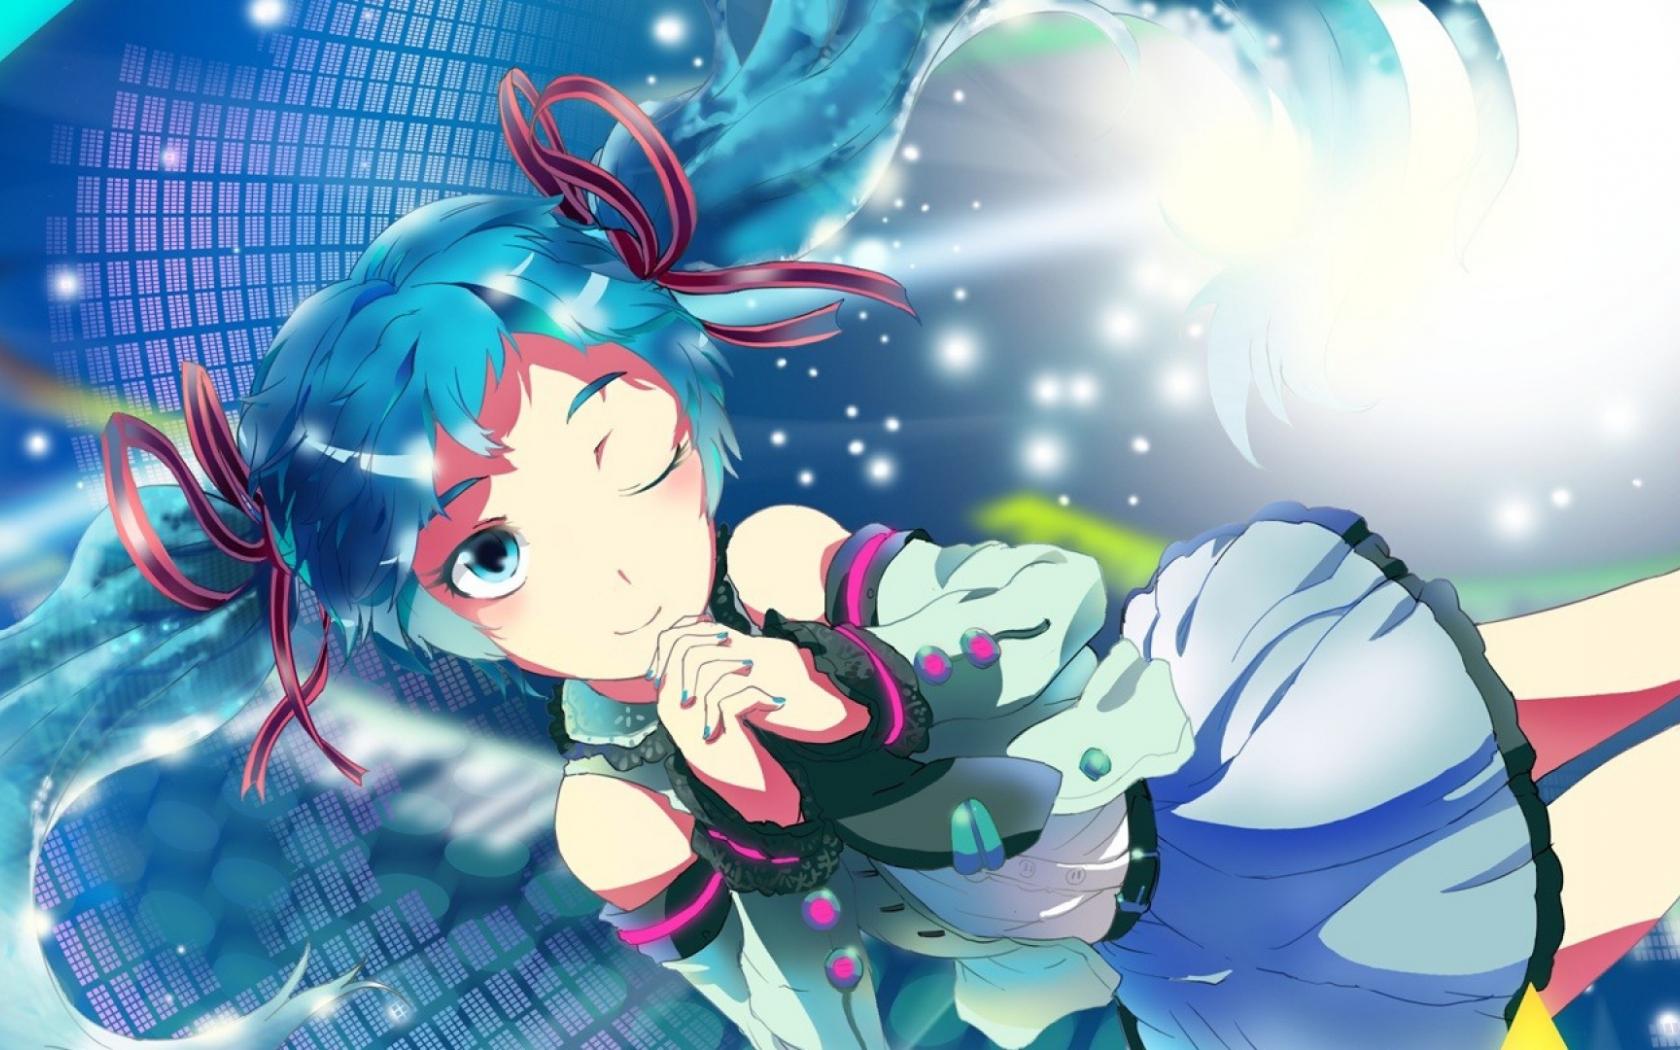 Free Download Download Wallpaper 2560x1080 Vocaloid Hatsune Miku Anime 2560x1080 2560x1080 For Your Desktop Mobile Tablet Explore 37 2560 X 1080 Anime Wallpaper I Love Anime Wallpaper 2560 X